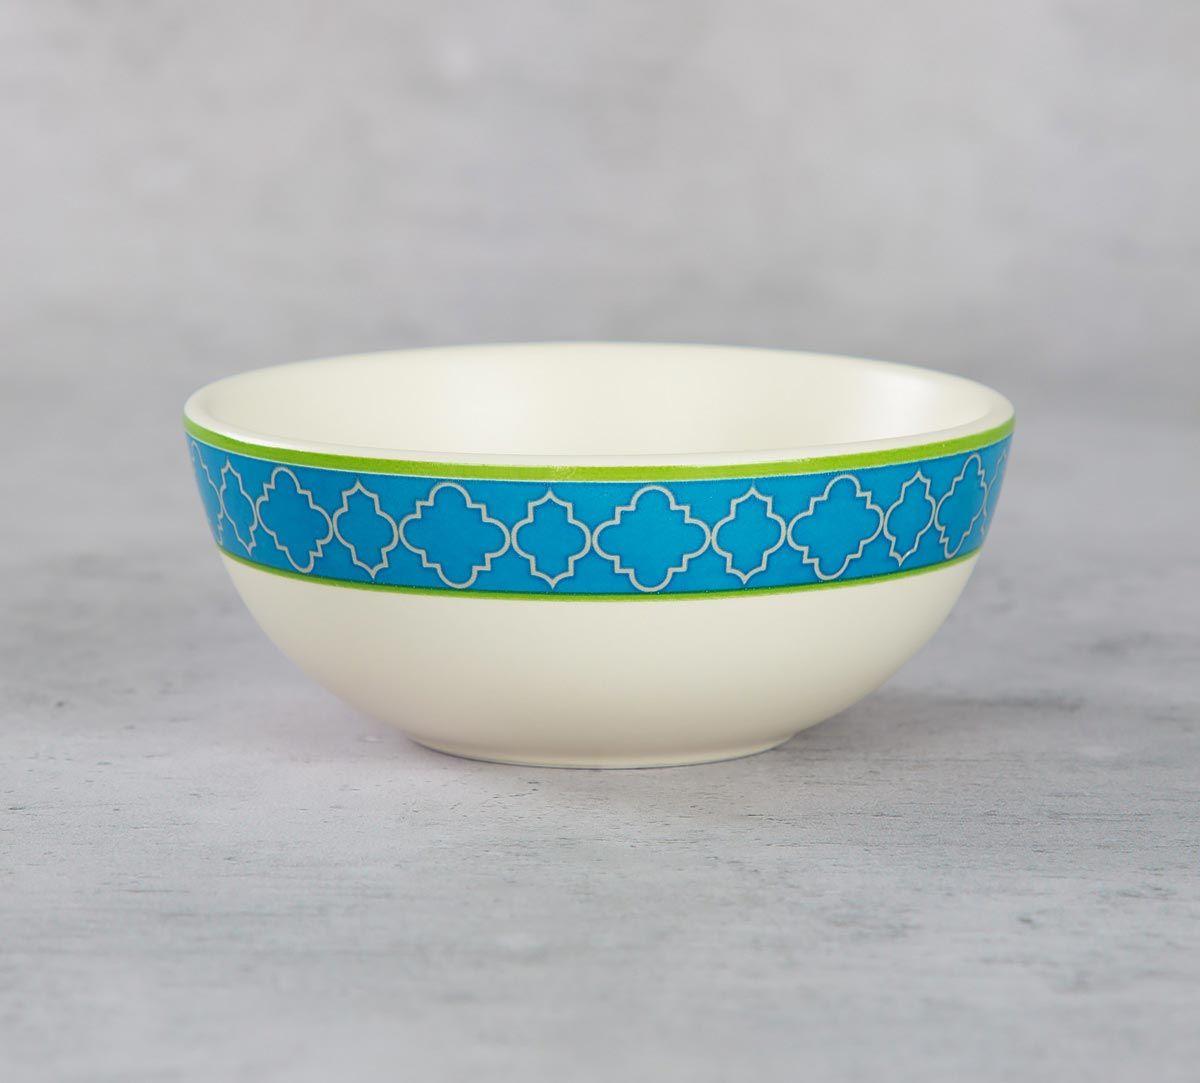 Buy Katori Bowls online in India on India Circus